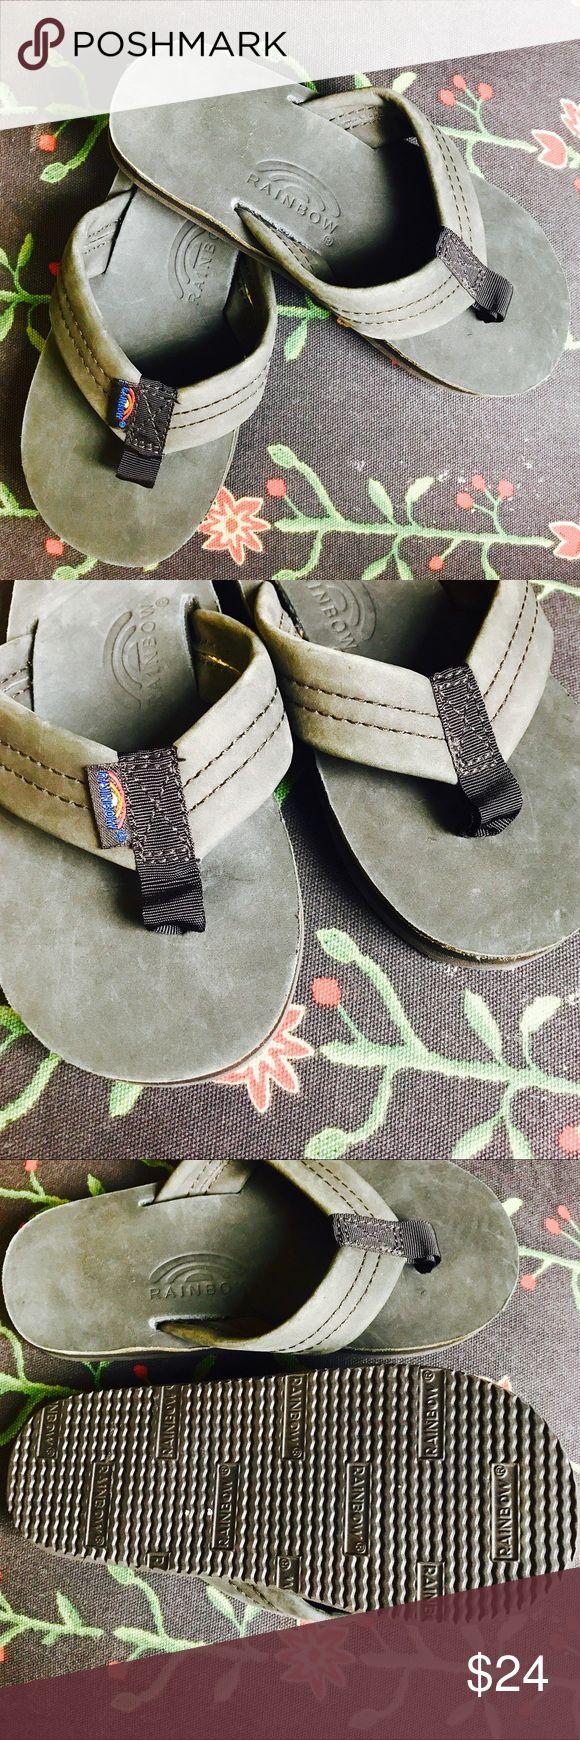 Black rainbow sandals with crystals - Kids Black Rainbow Sandals